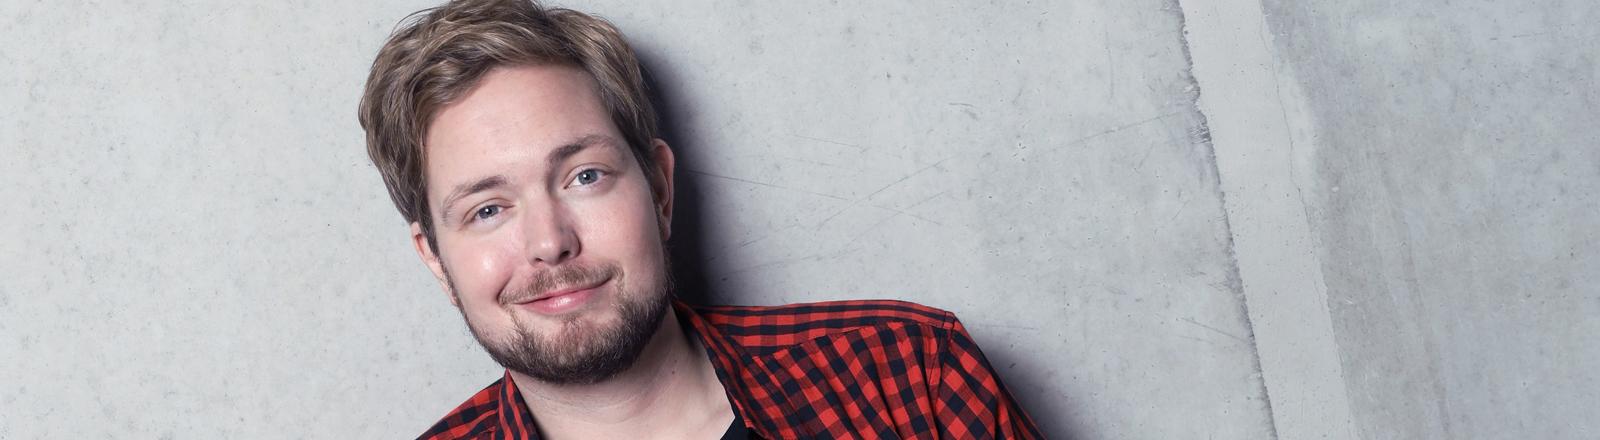 Comedian Bastian Bielendorfer